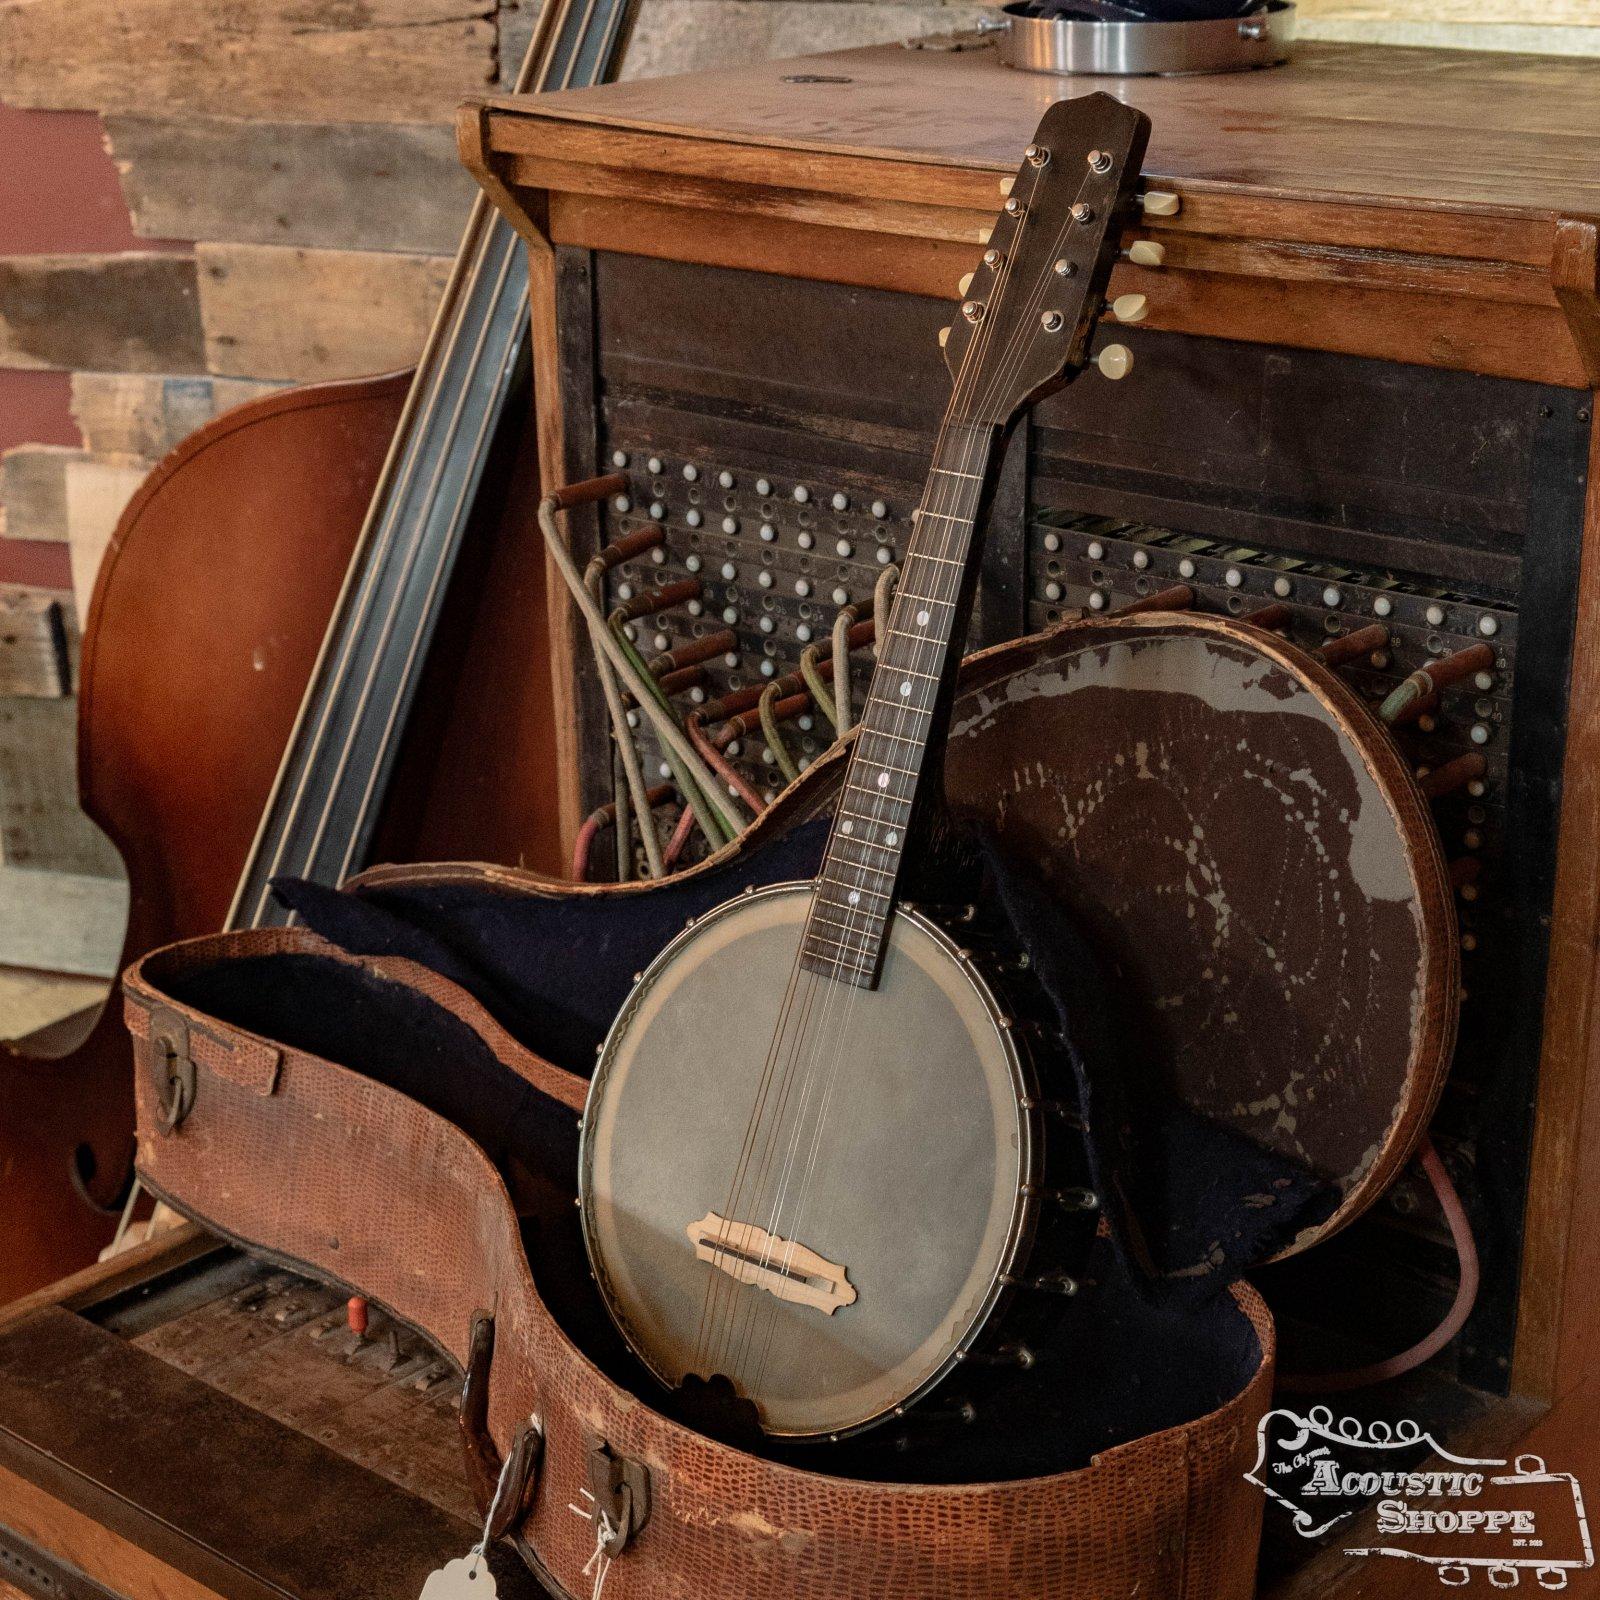 (Vintage) 1922-25 Gibson Junior Mandolin Banjo Style MB-JR